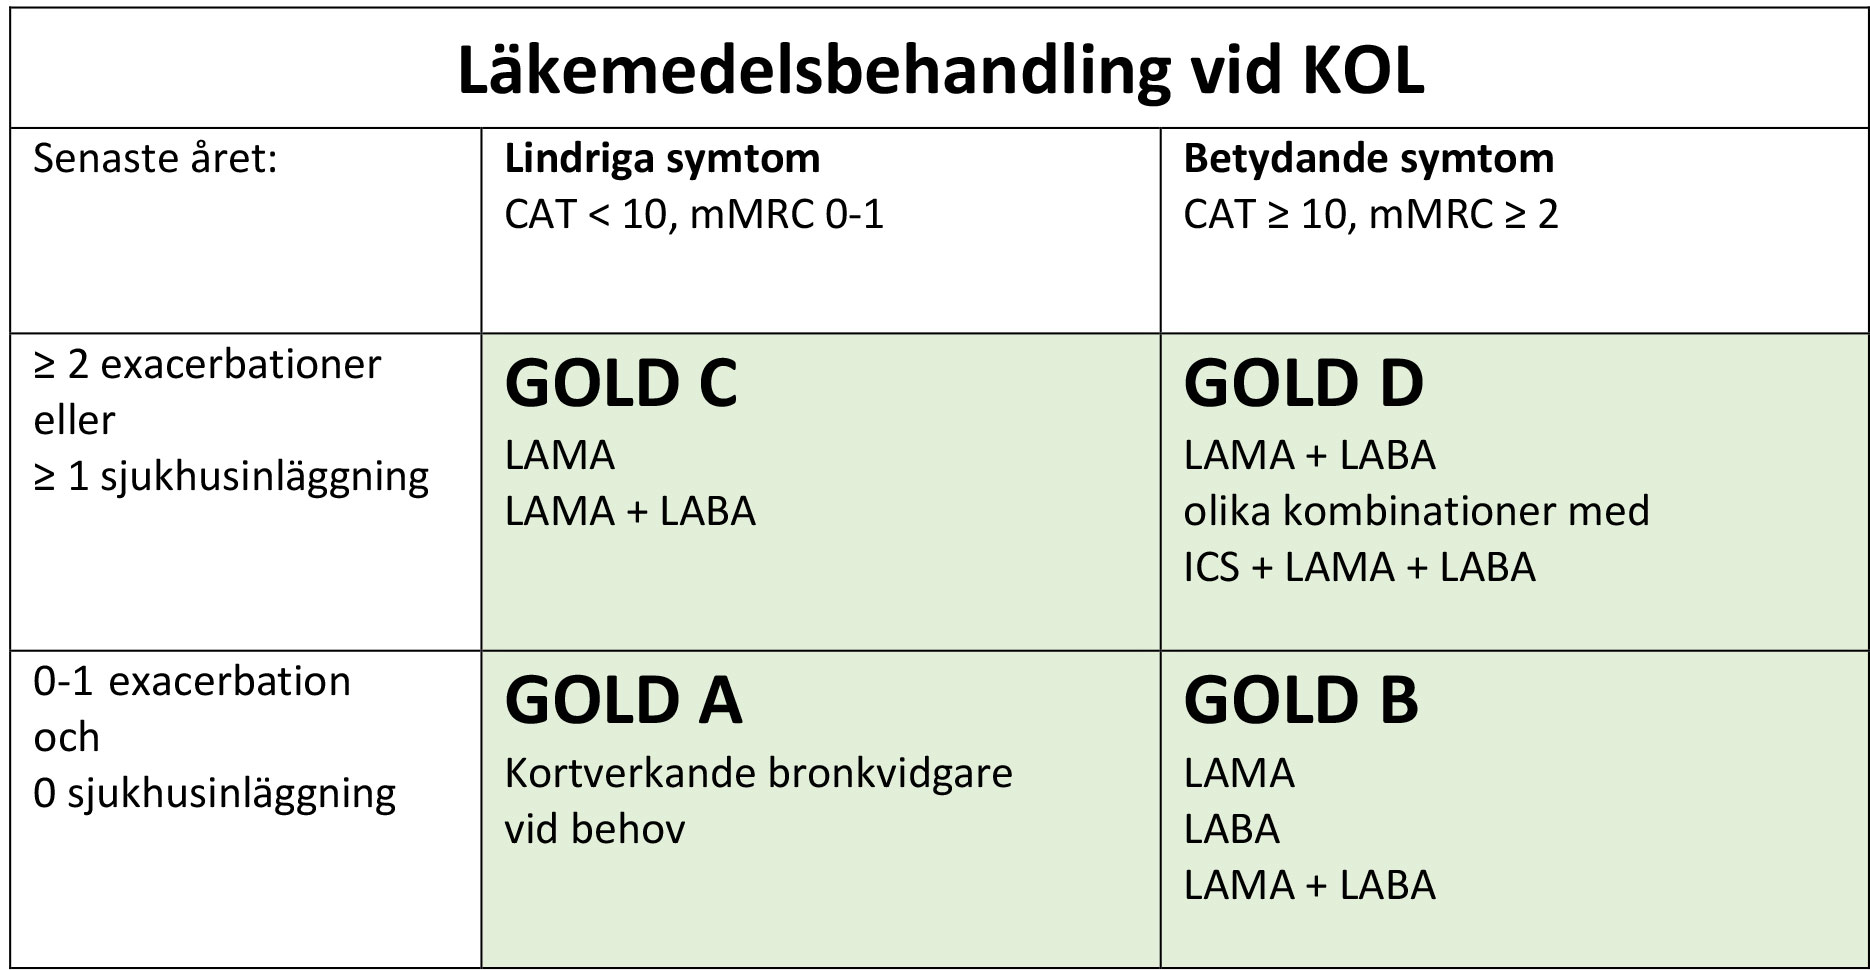 Läkemedelsbehandling vid KOL GOLD A - D